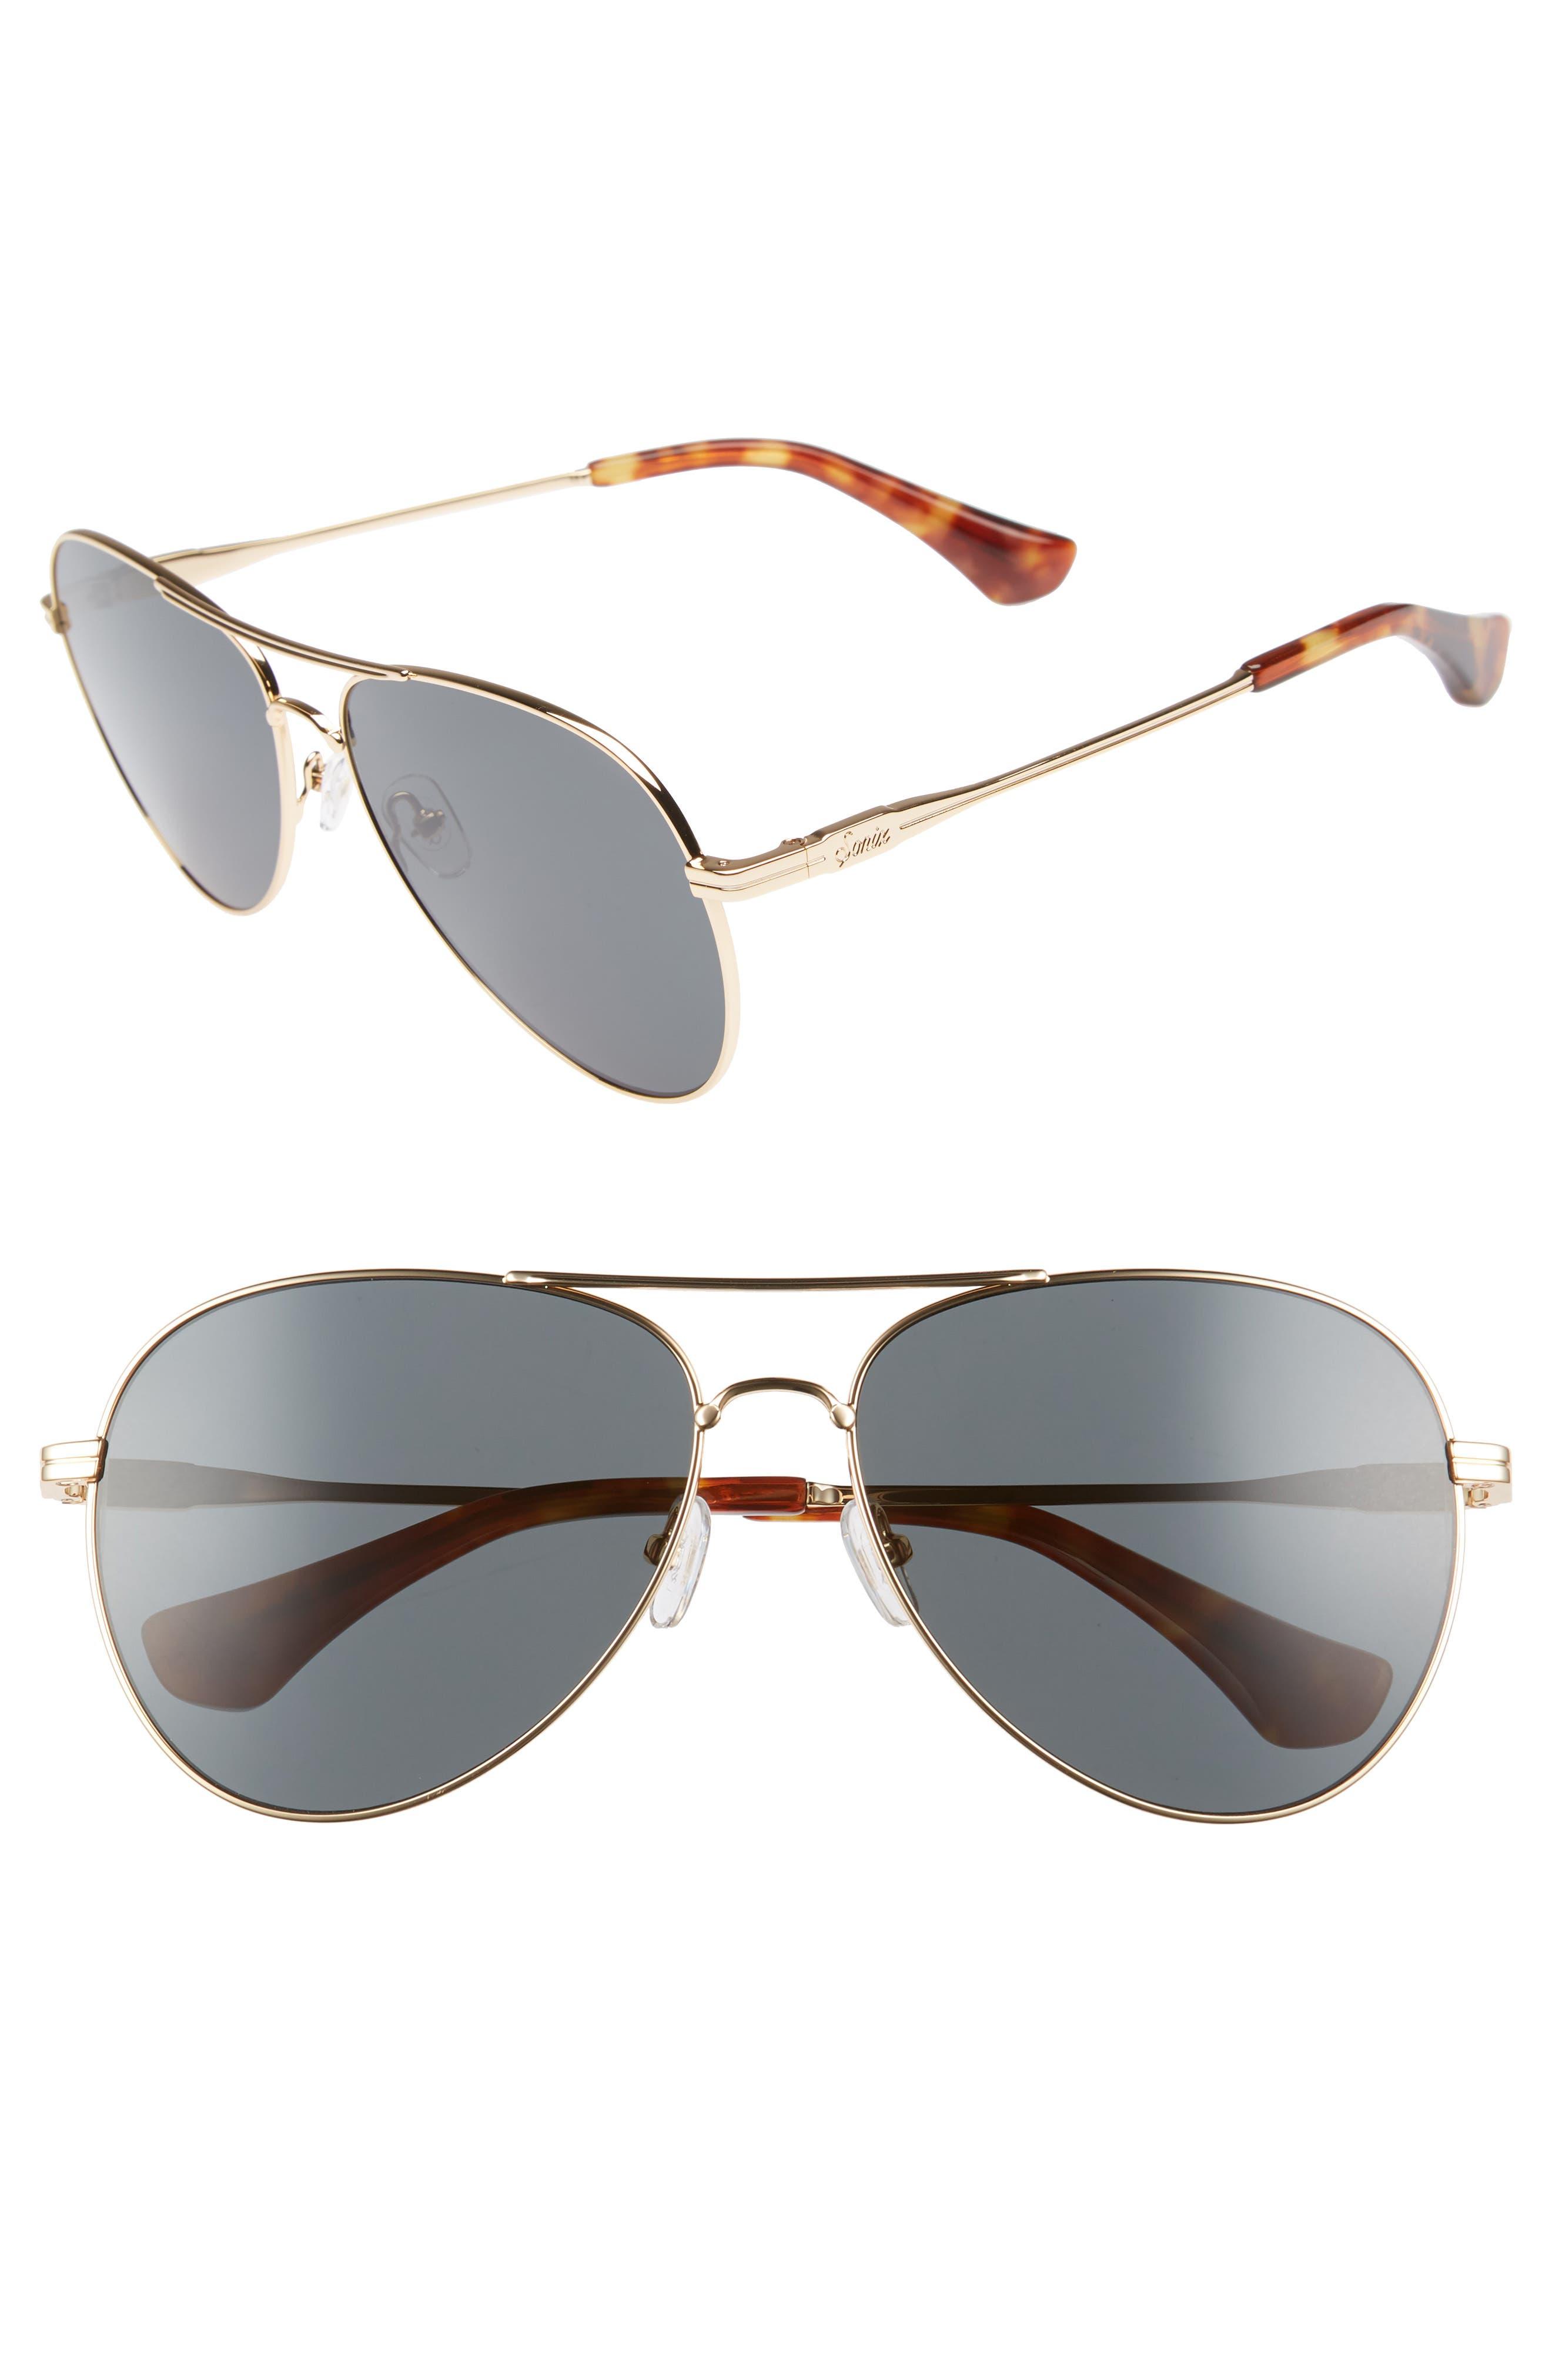 Lodi 61mm Mirrored Aviator Sunglasses,                             Main thumbnail 1, color,                             714